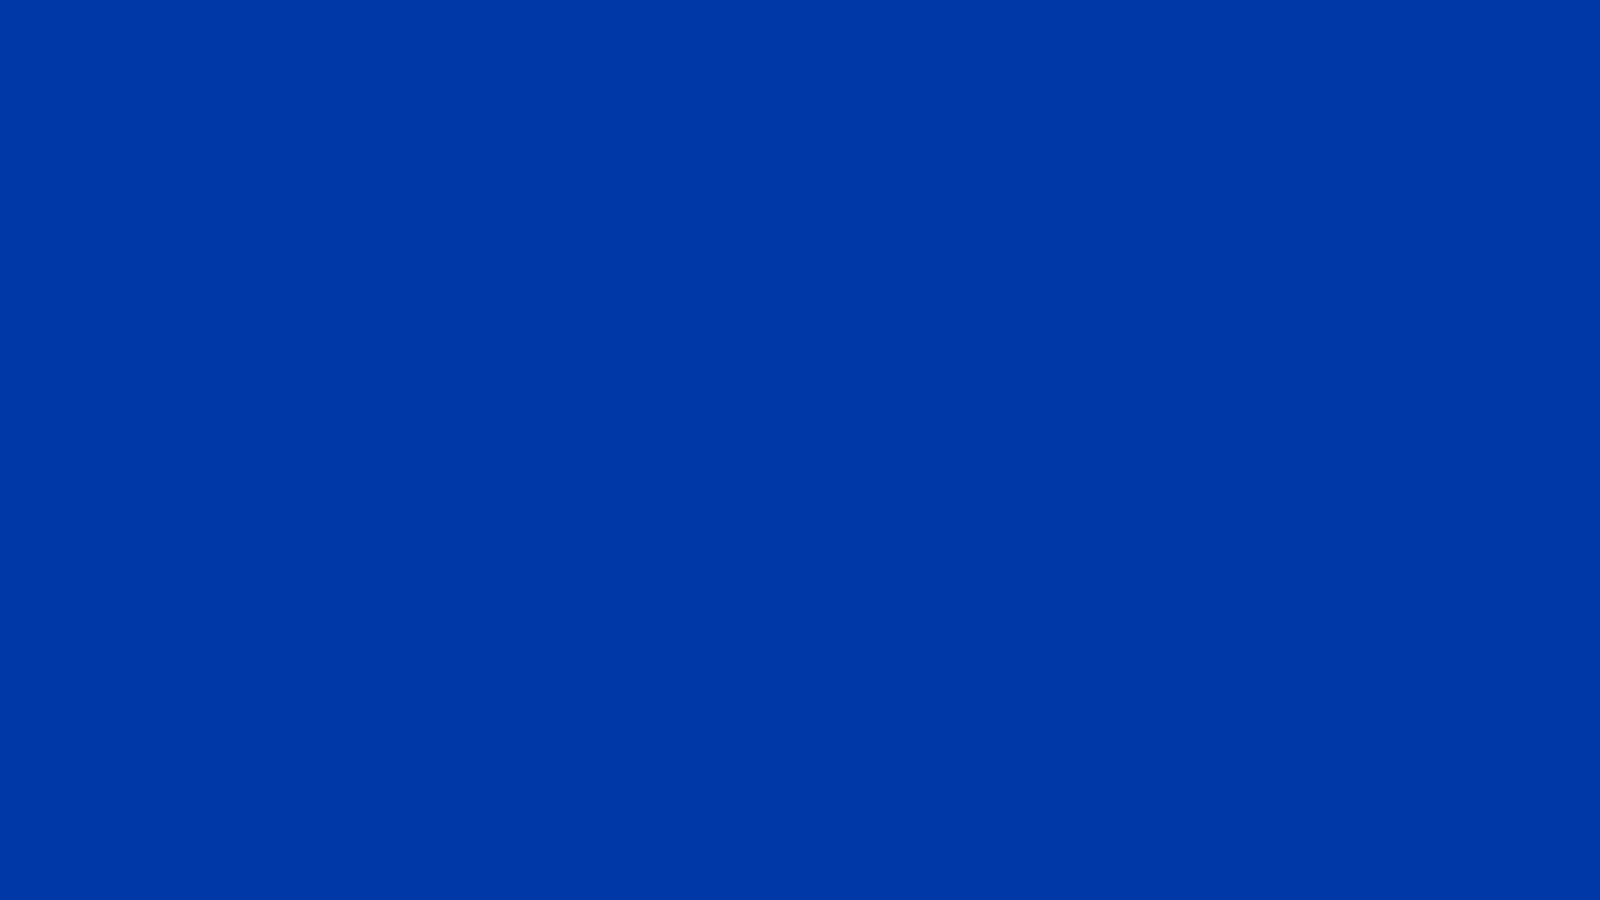 1600x900 Royal Azure Solid Color Background